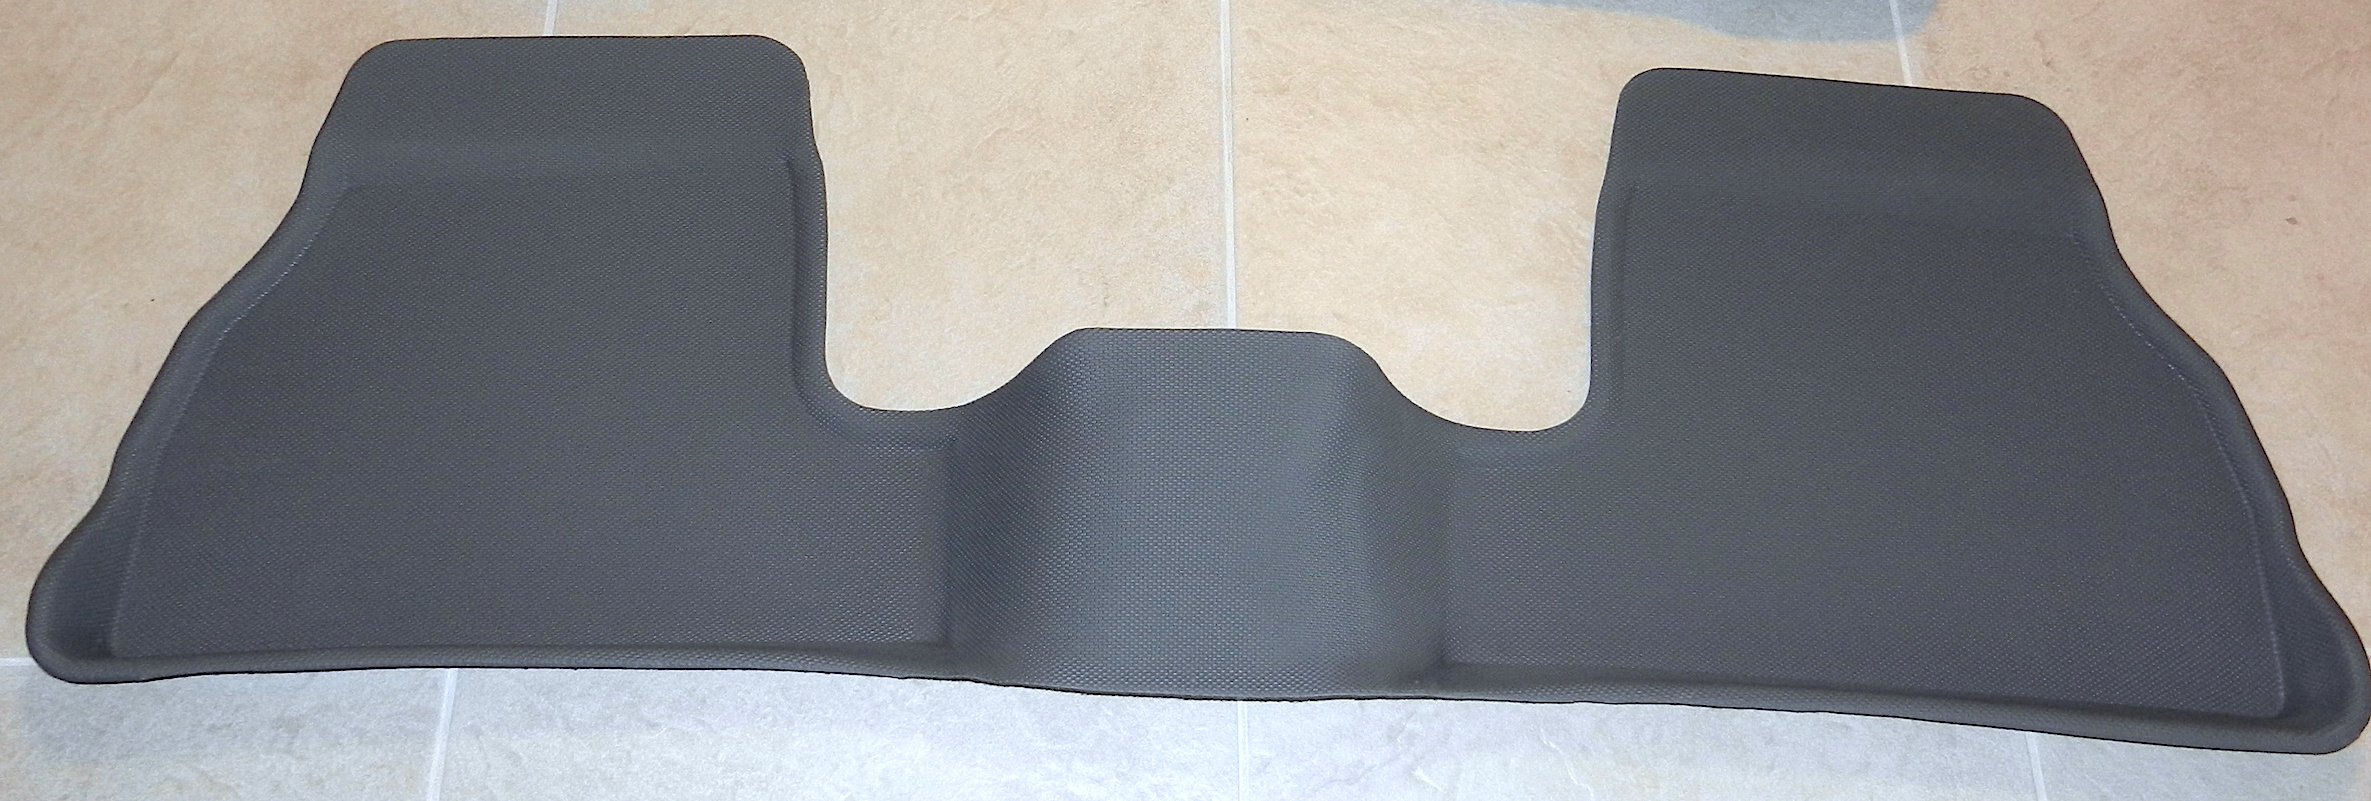 For Sale: Aries3D/Maxspider3D floor liners-dscn0723.jpg